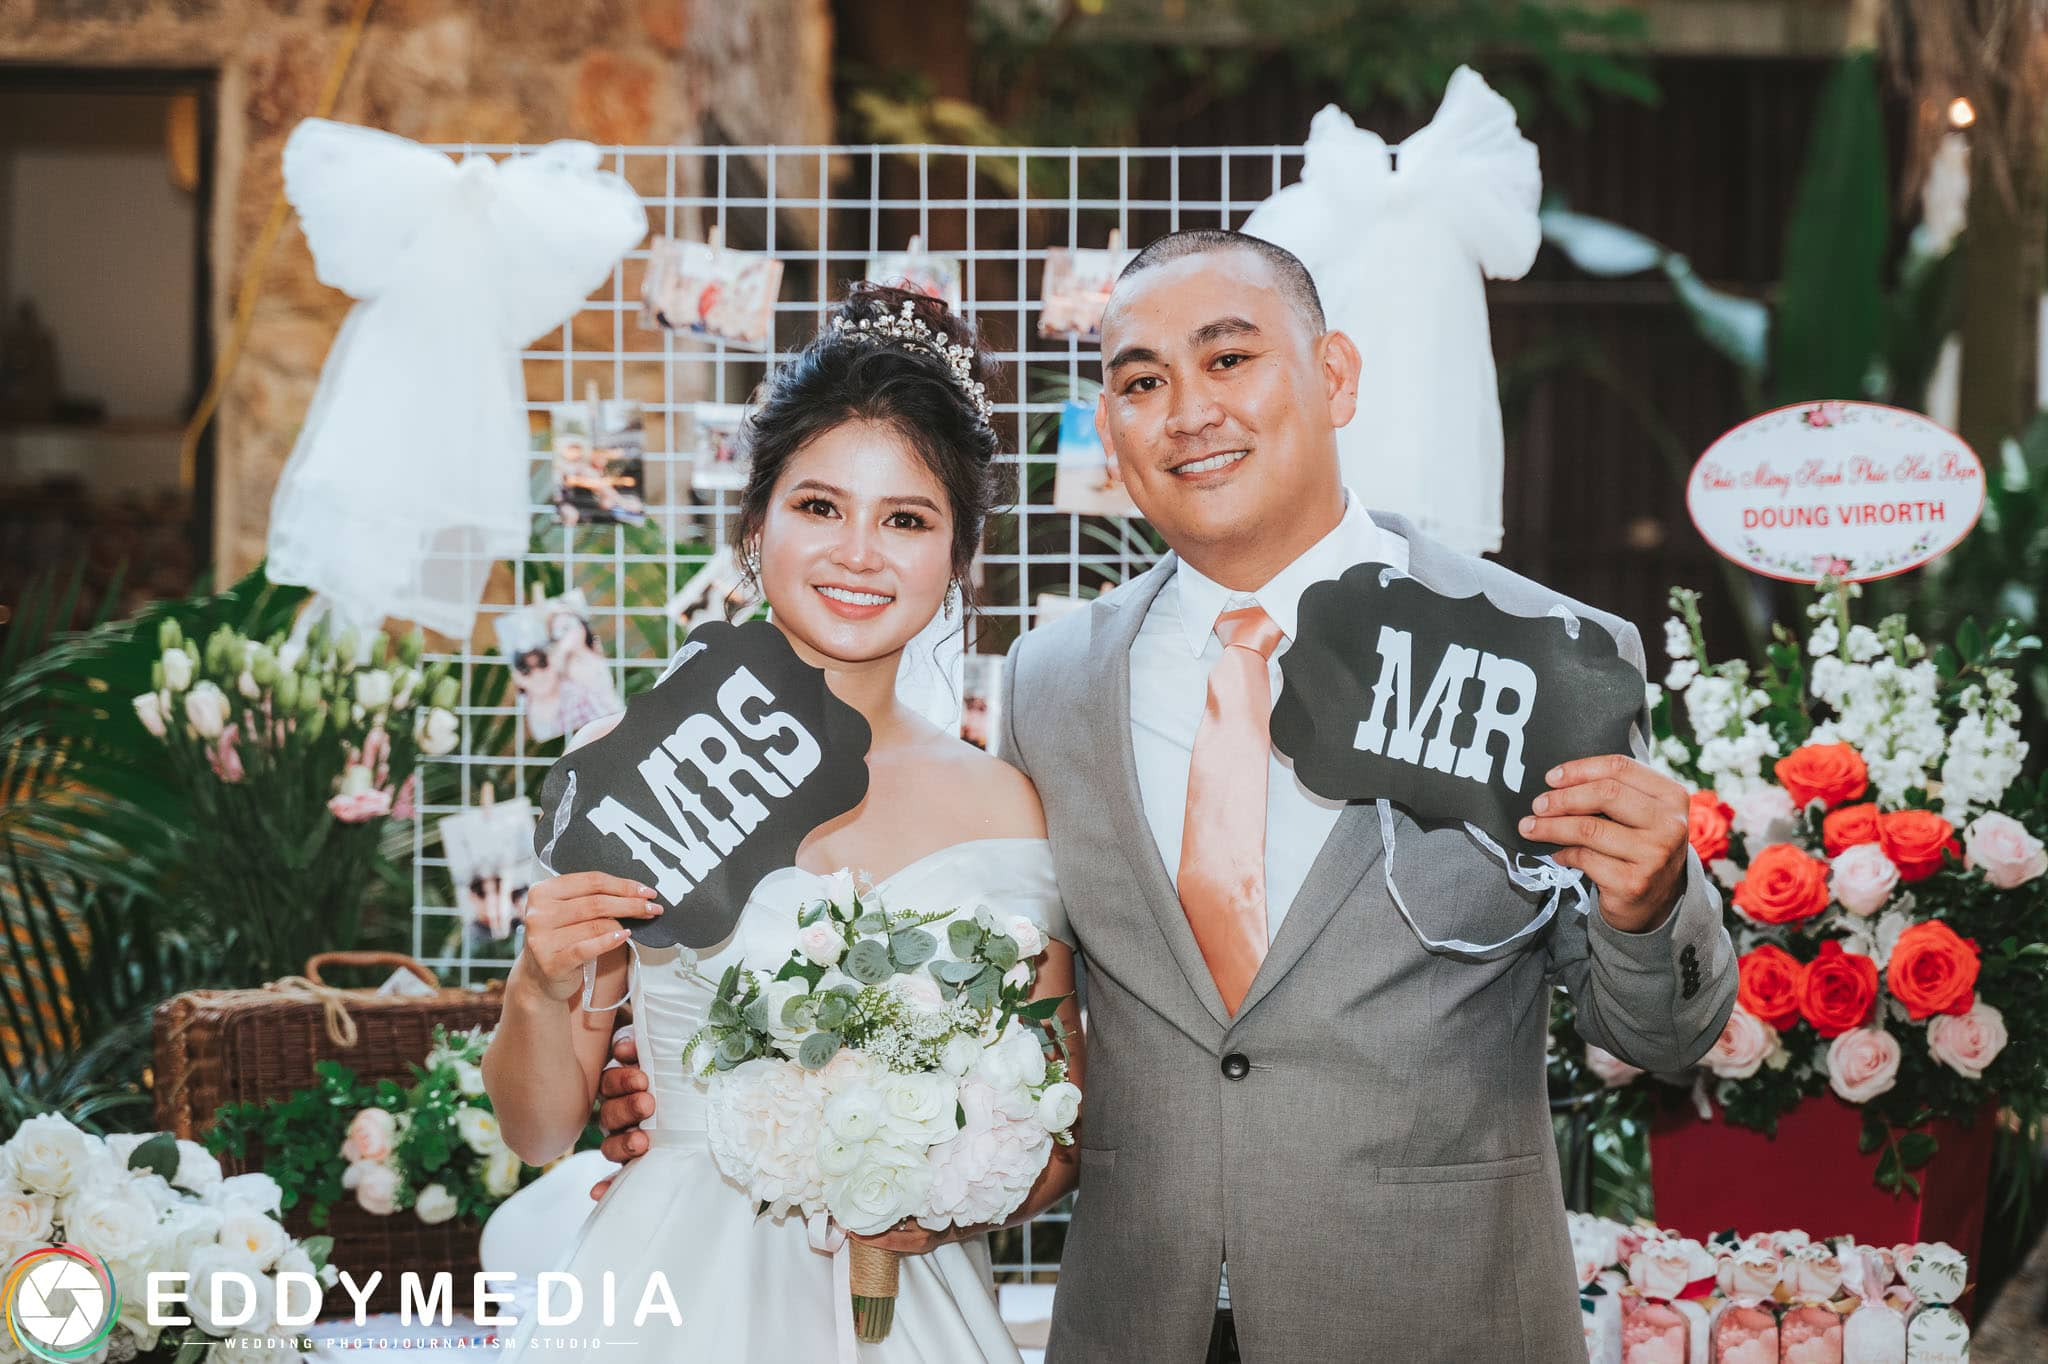 Phongsucuoi James KieuThuy EddyMedia 46 tiệc cưới ngoài trời